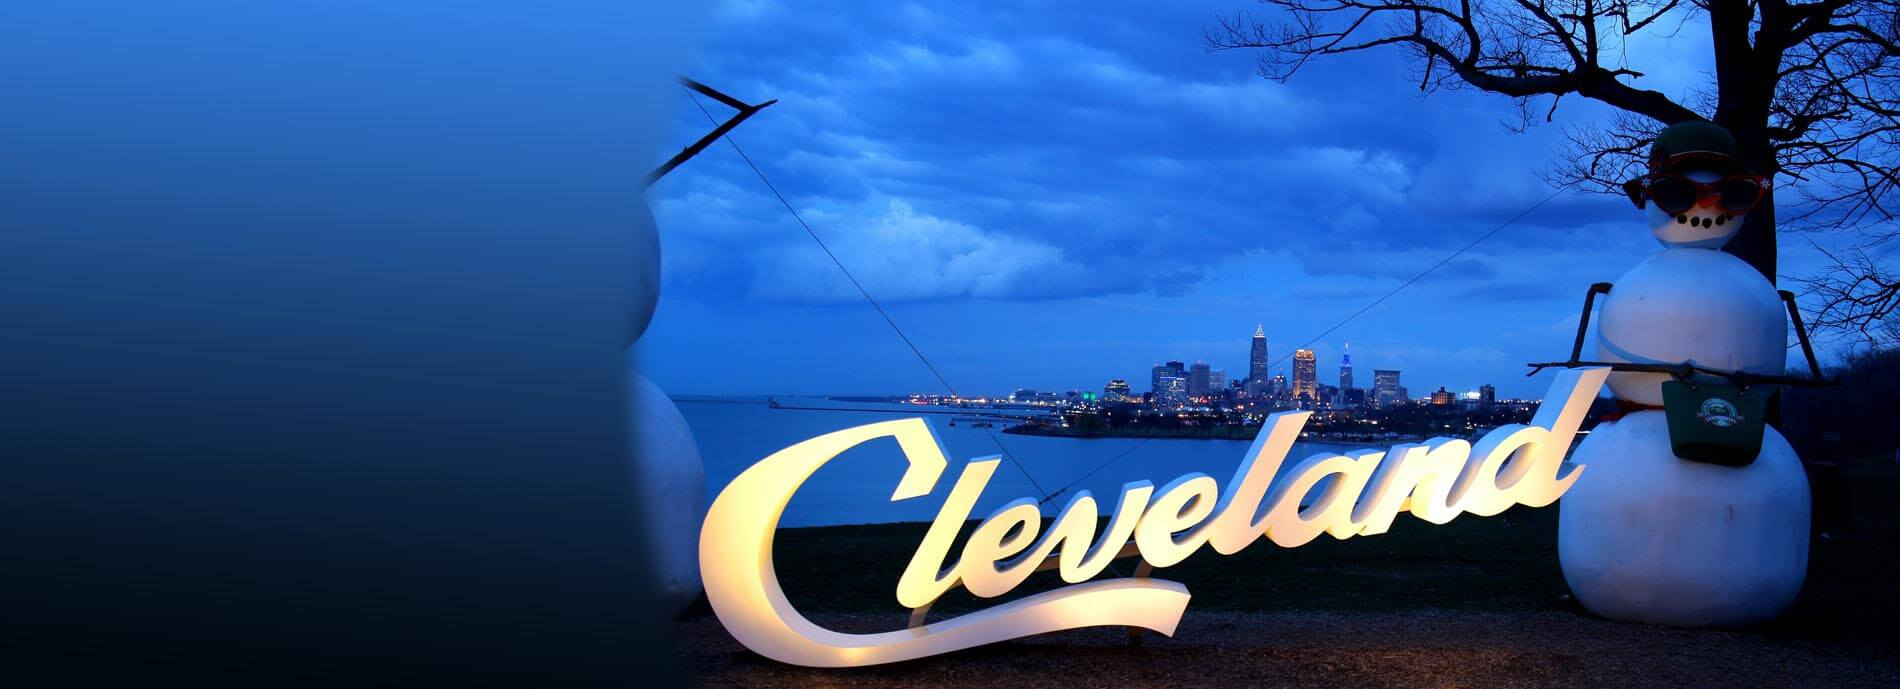 Cleveland slide - sign over lake, city in background